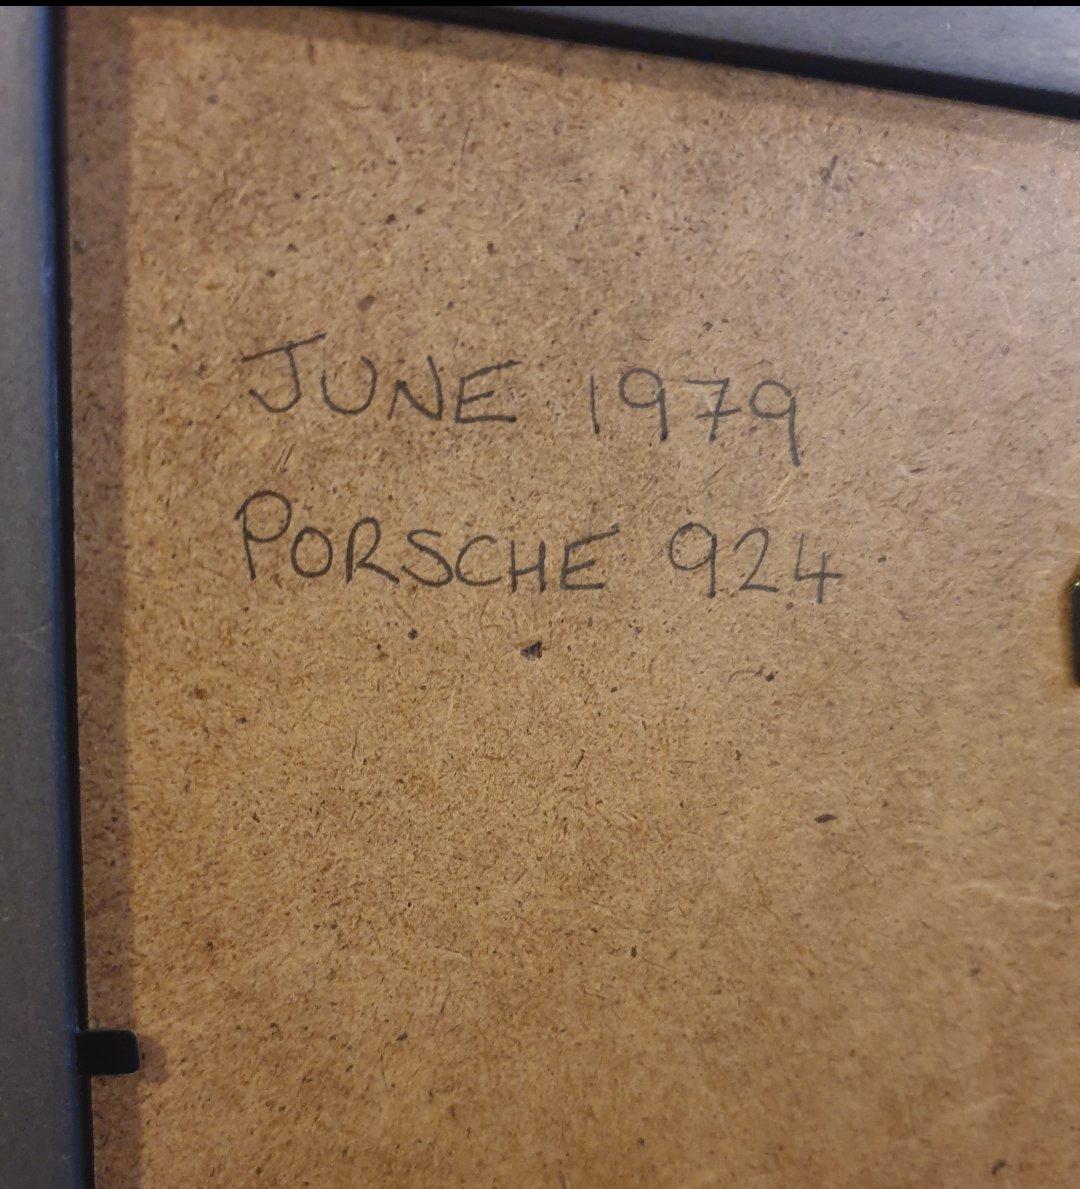 1979 Original Porsche 924 advert For Sale (picture 2 of 2)